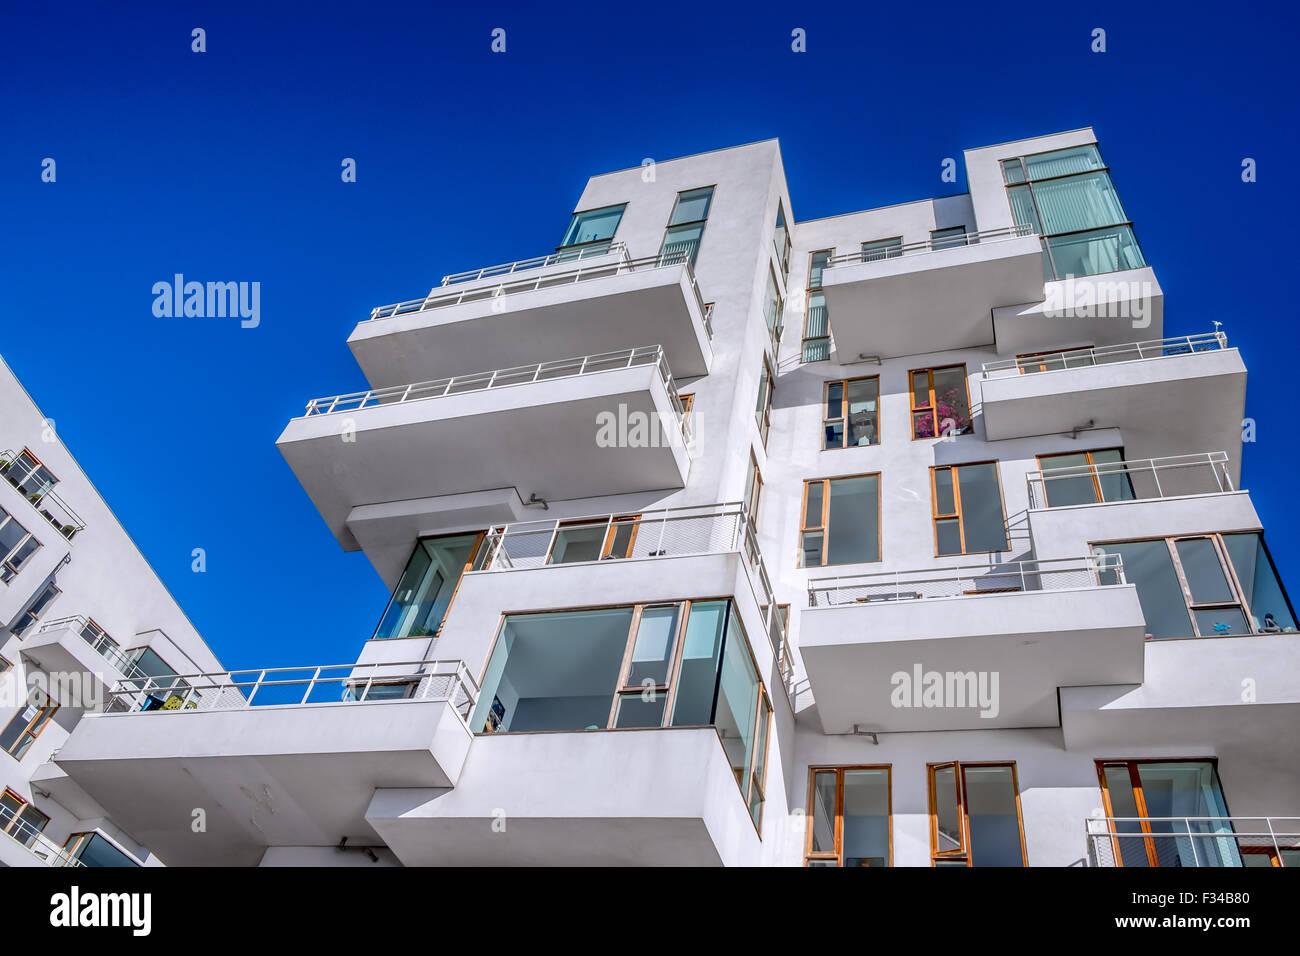 Havneholmen or Harbour Isle, modern city apartments at Copenhagen waterfront, Kalvebod Brygge, Copenhagen, Denmark - Stock Image